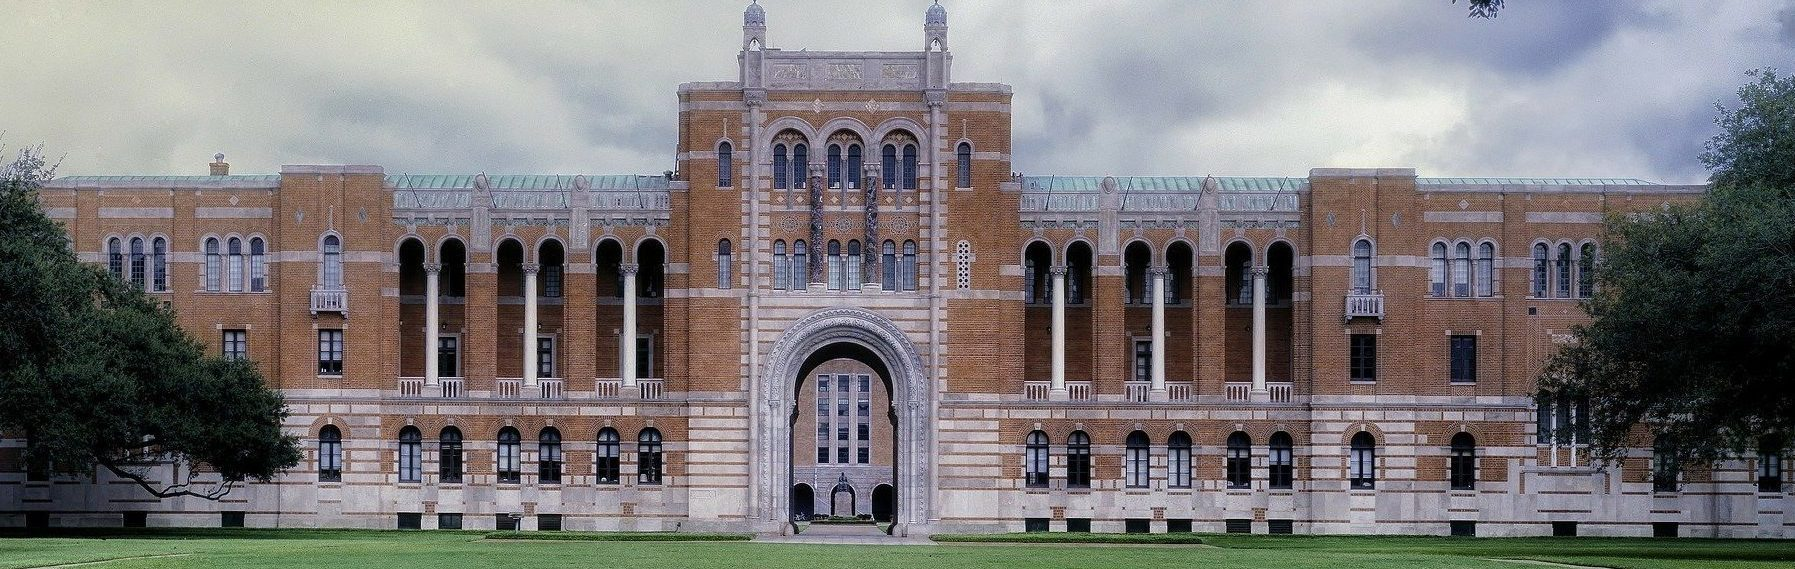 large university building